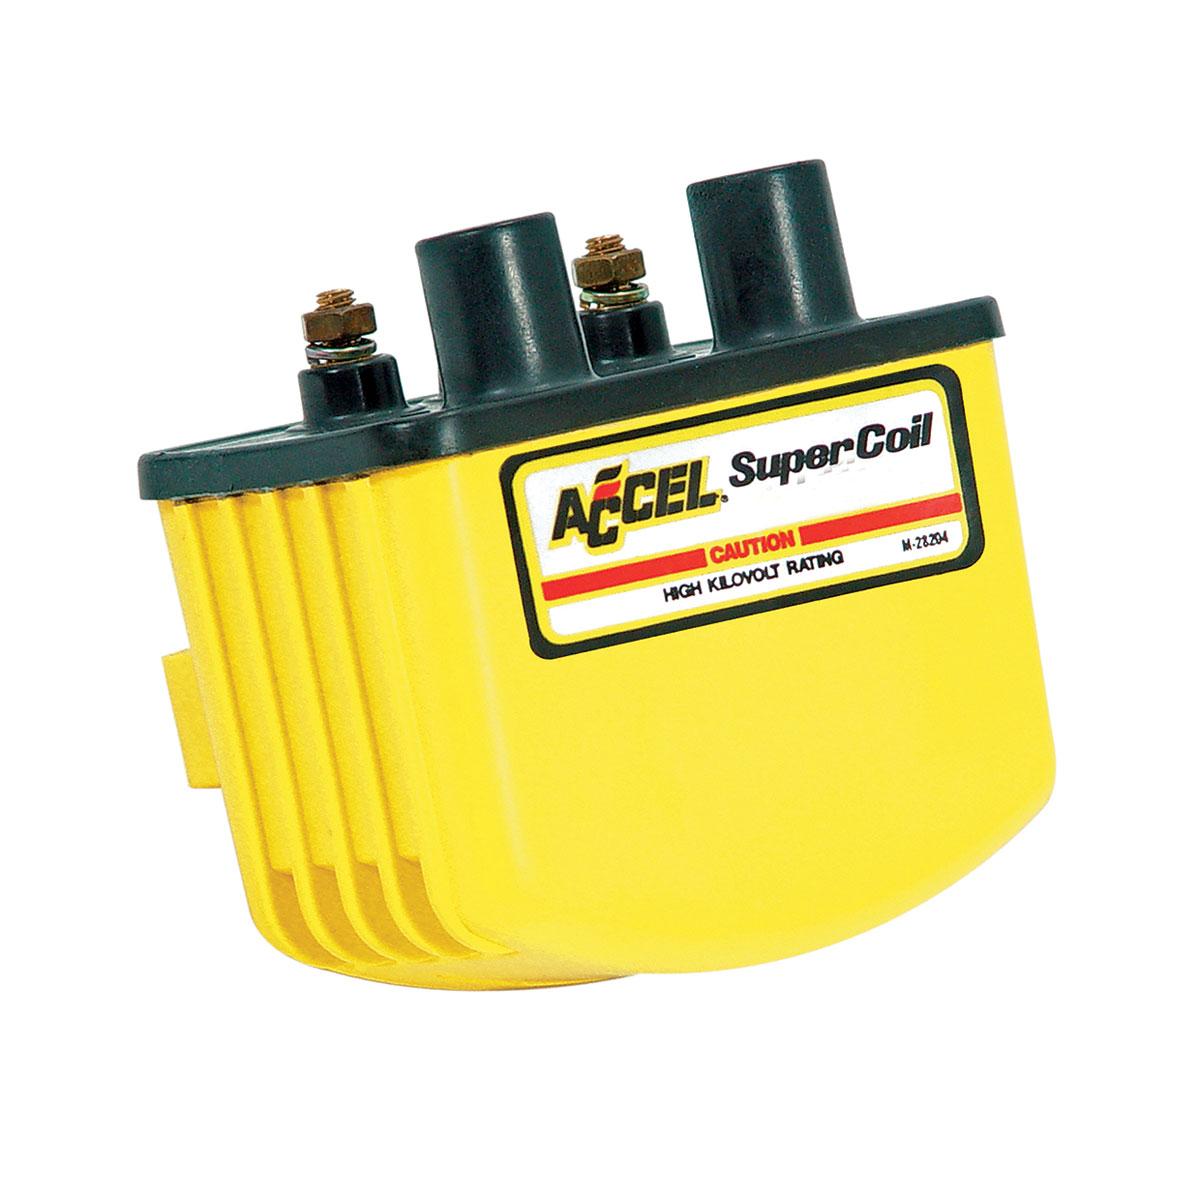 ACCEL Yellow Single Fire Super Coil - 140408